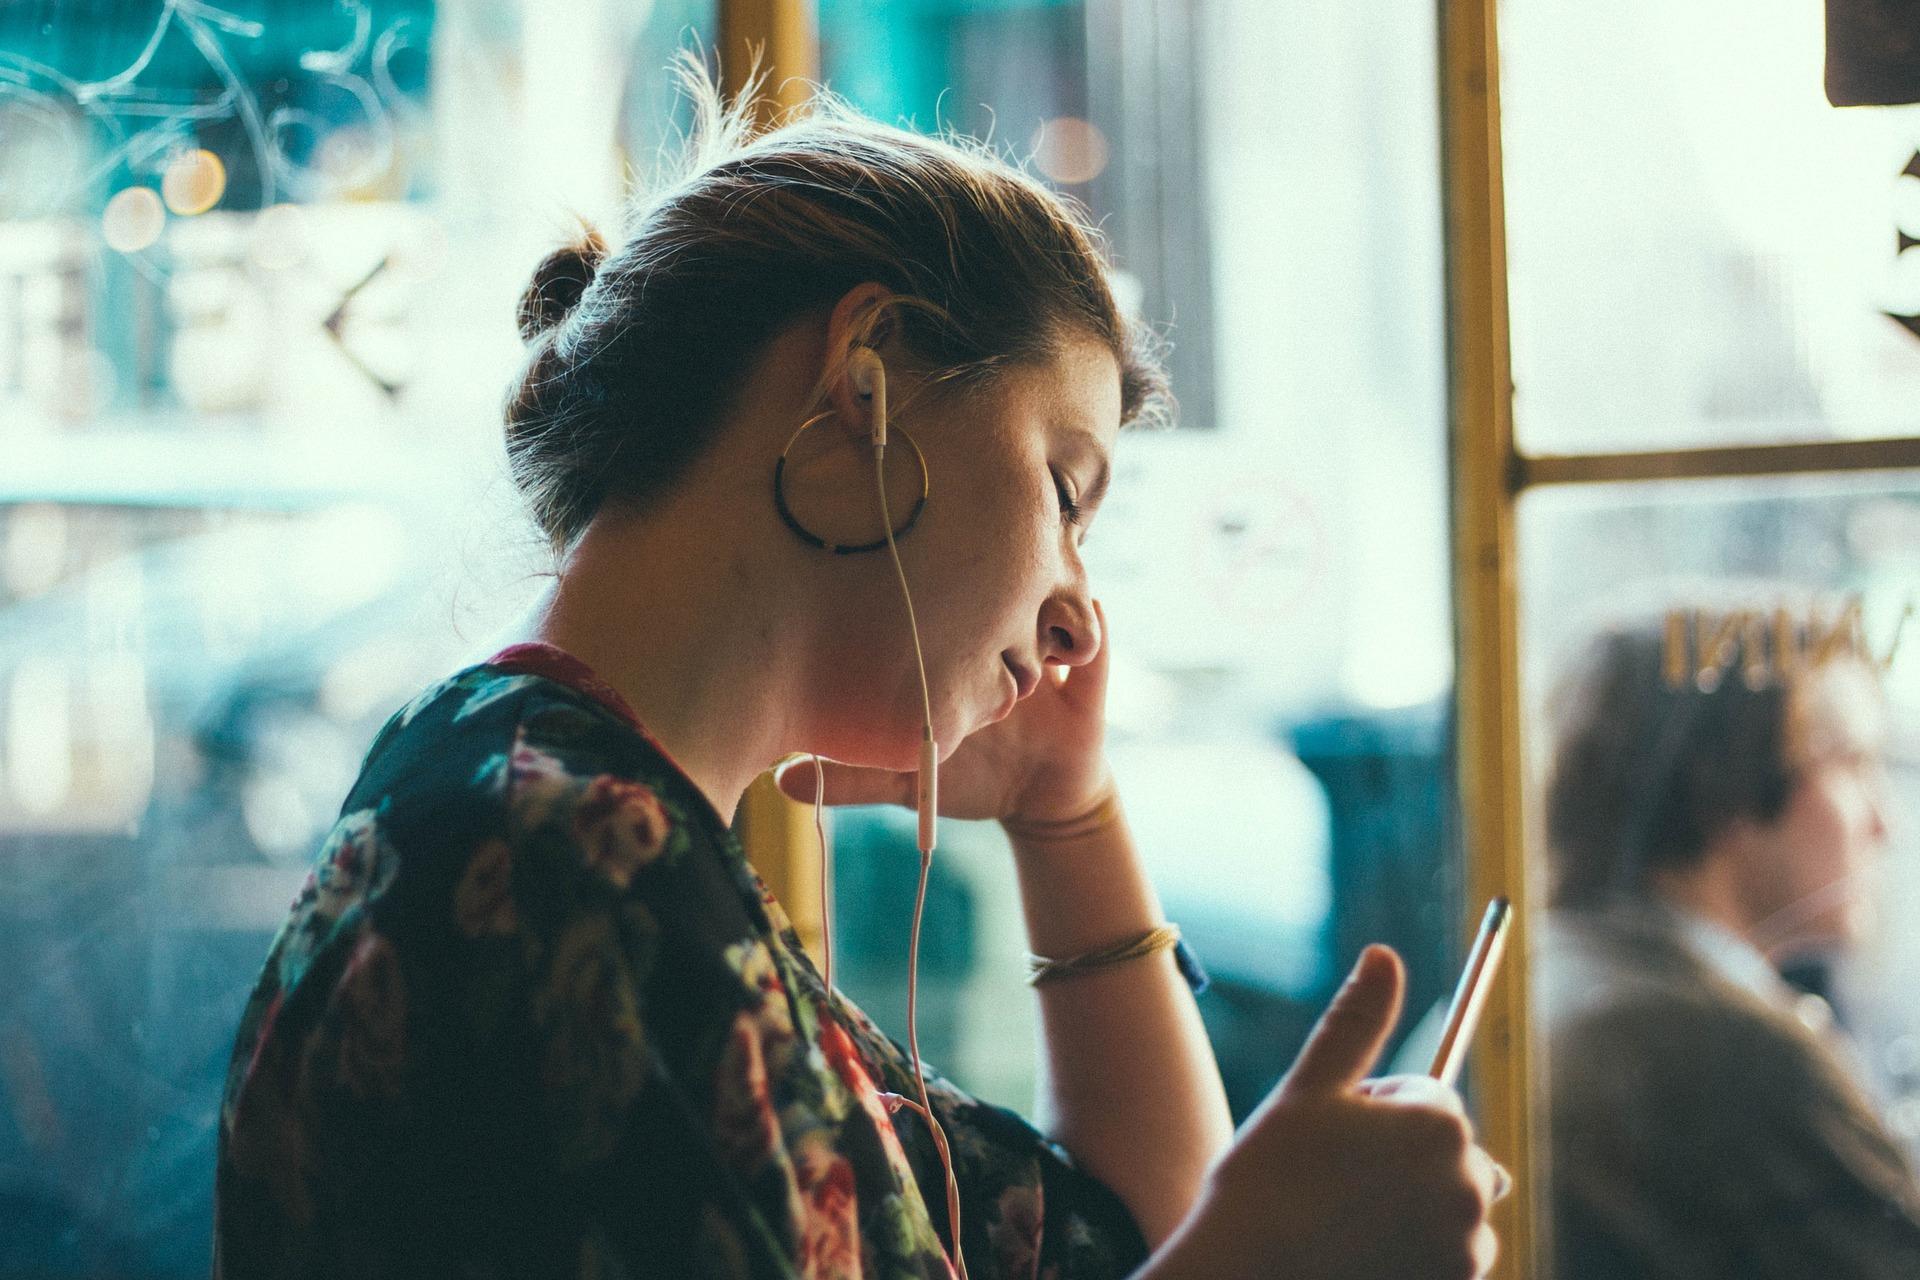 Dívka - mileniálka - poslech hudby - hudba - holka